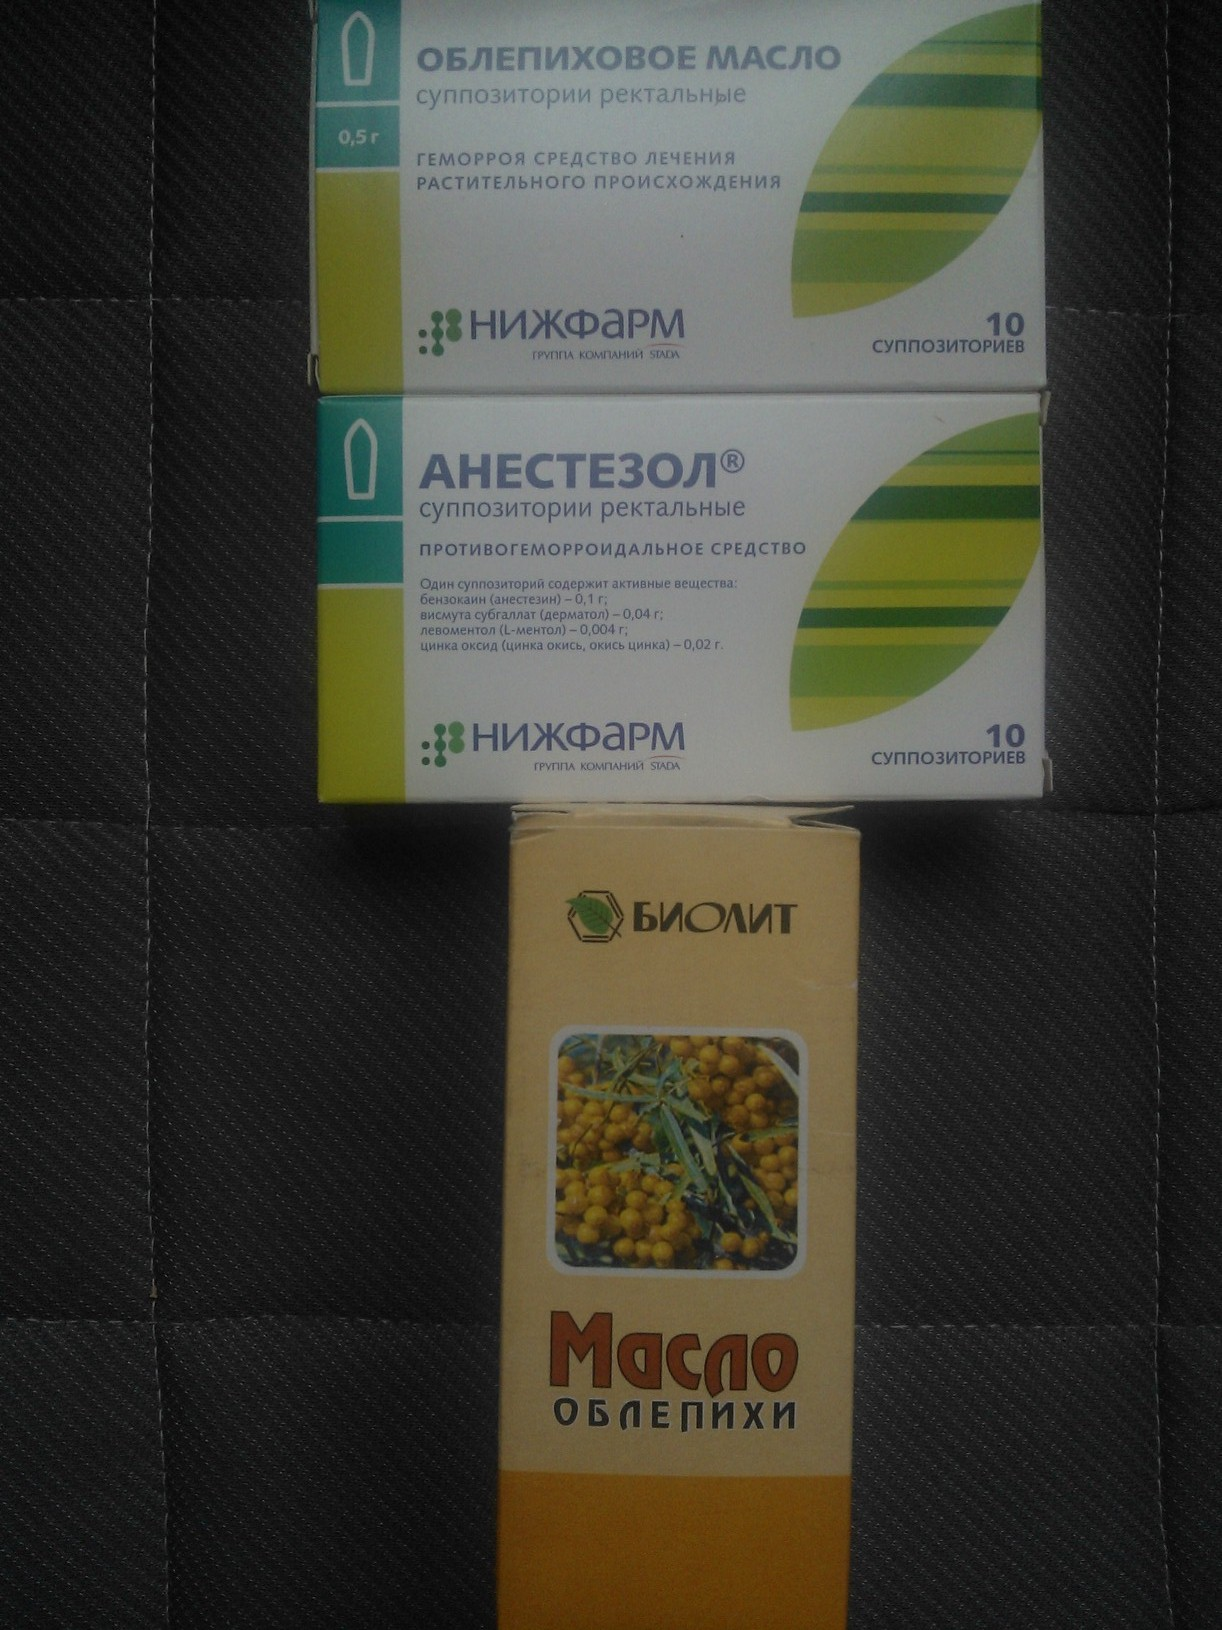 gemorroj-posle-rodov-chto-delat   www.u-children.ru